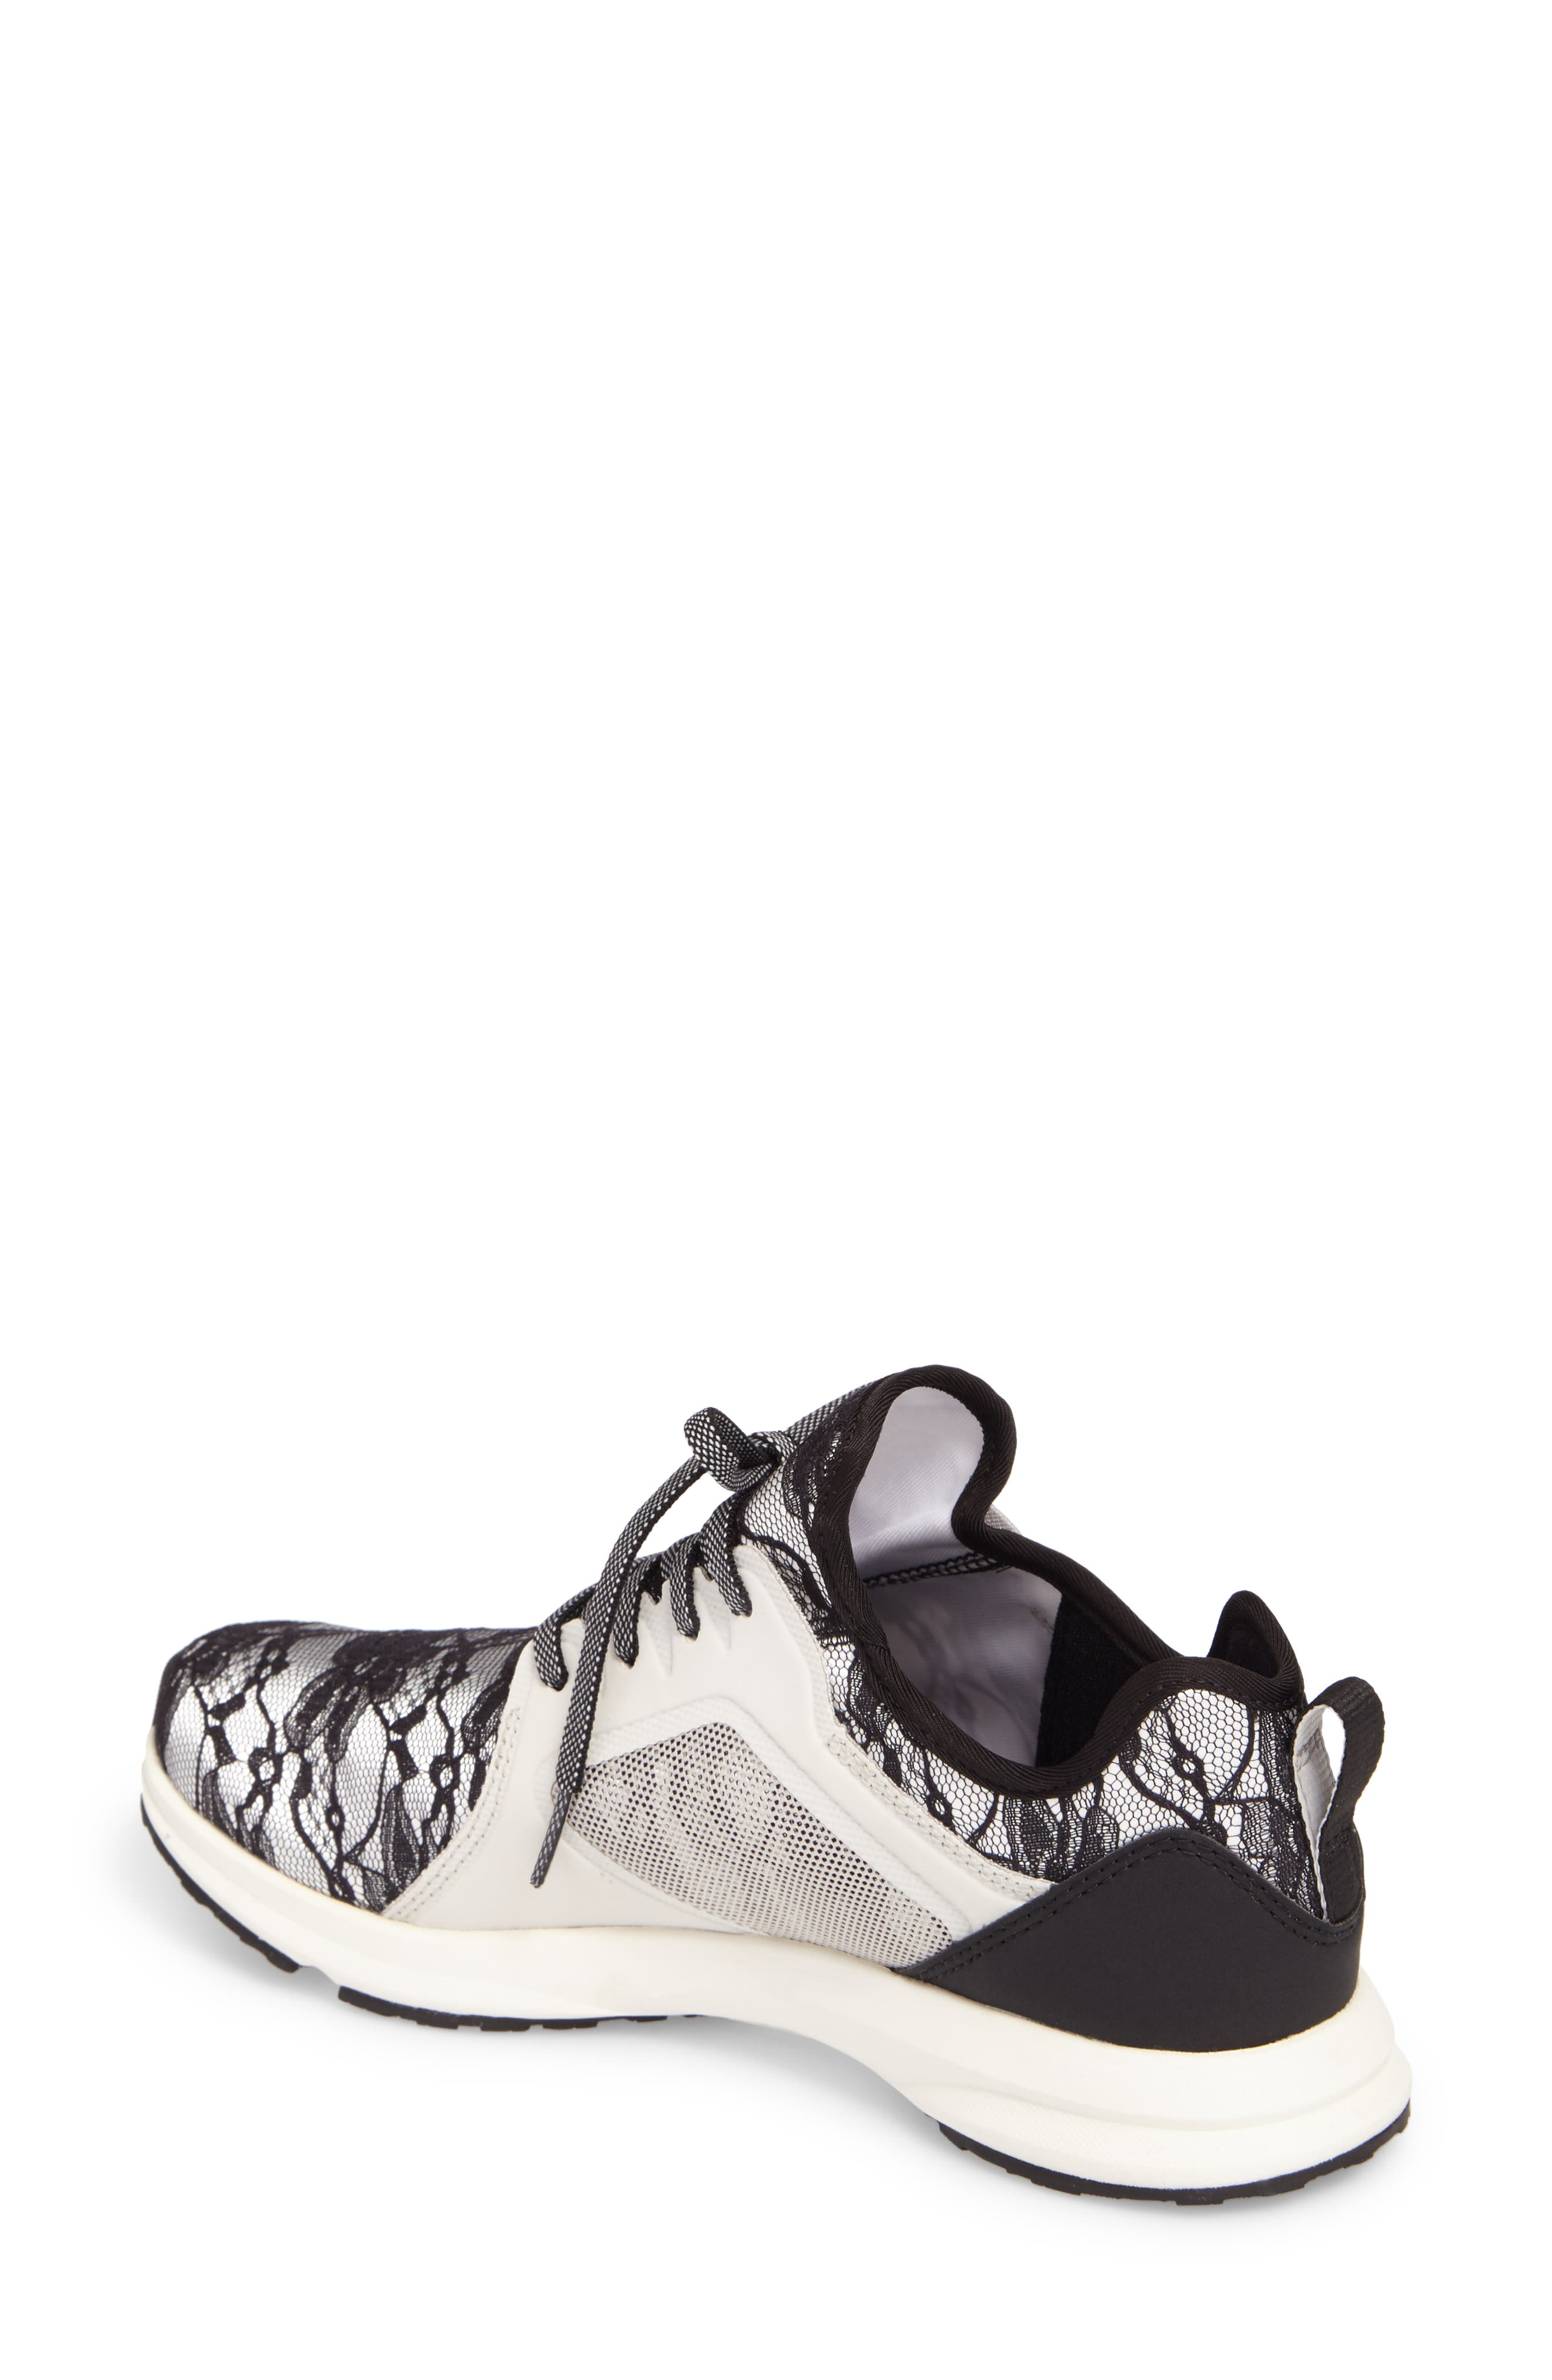 Fuse Print Sneaker,                             Alternate thumbnail 2, color,                             001